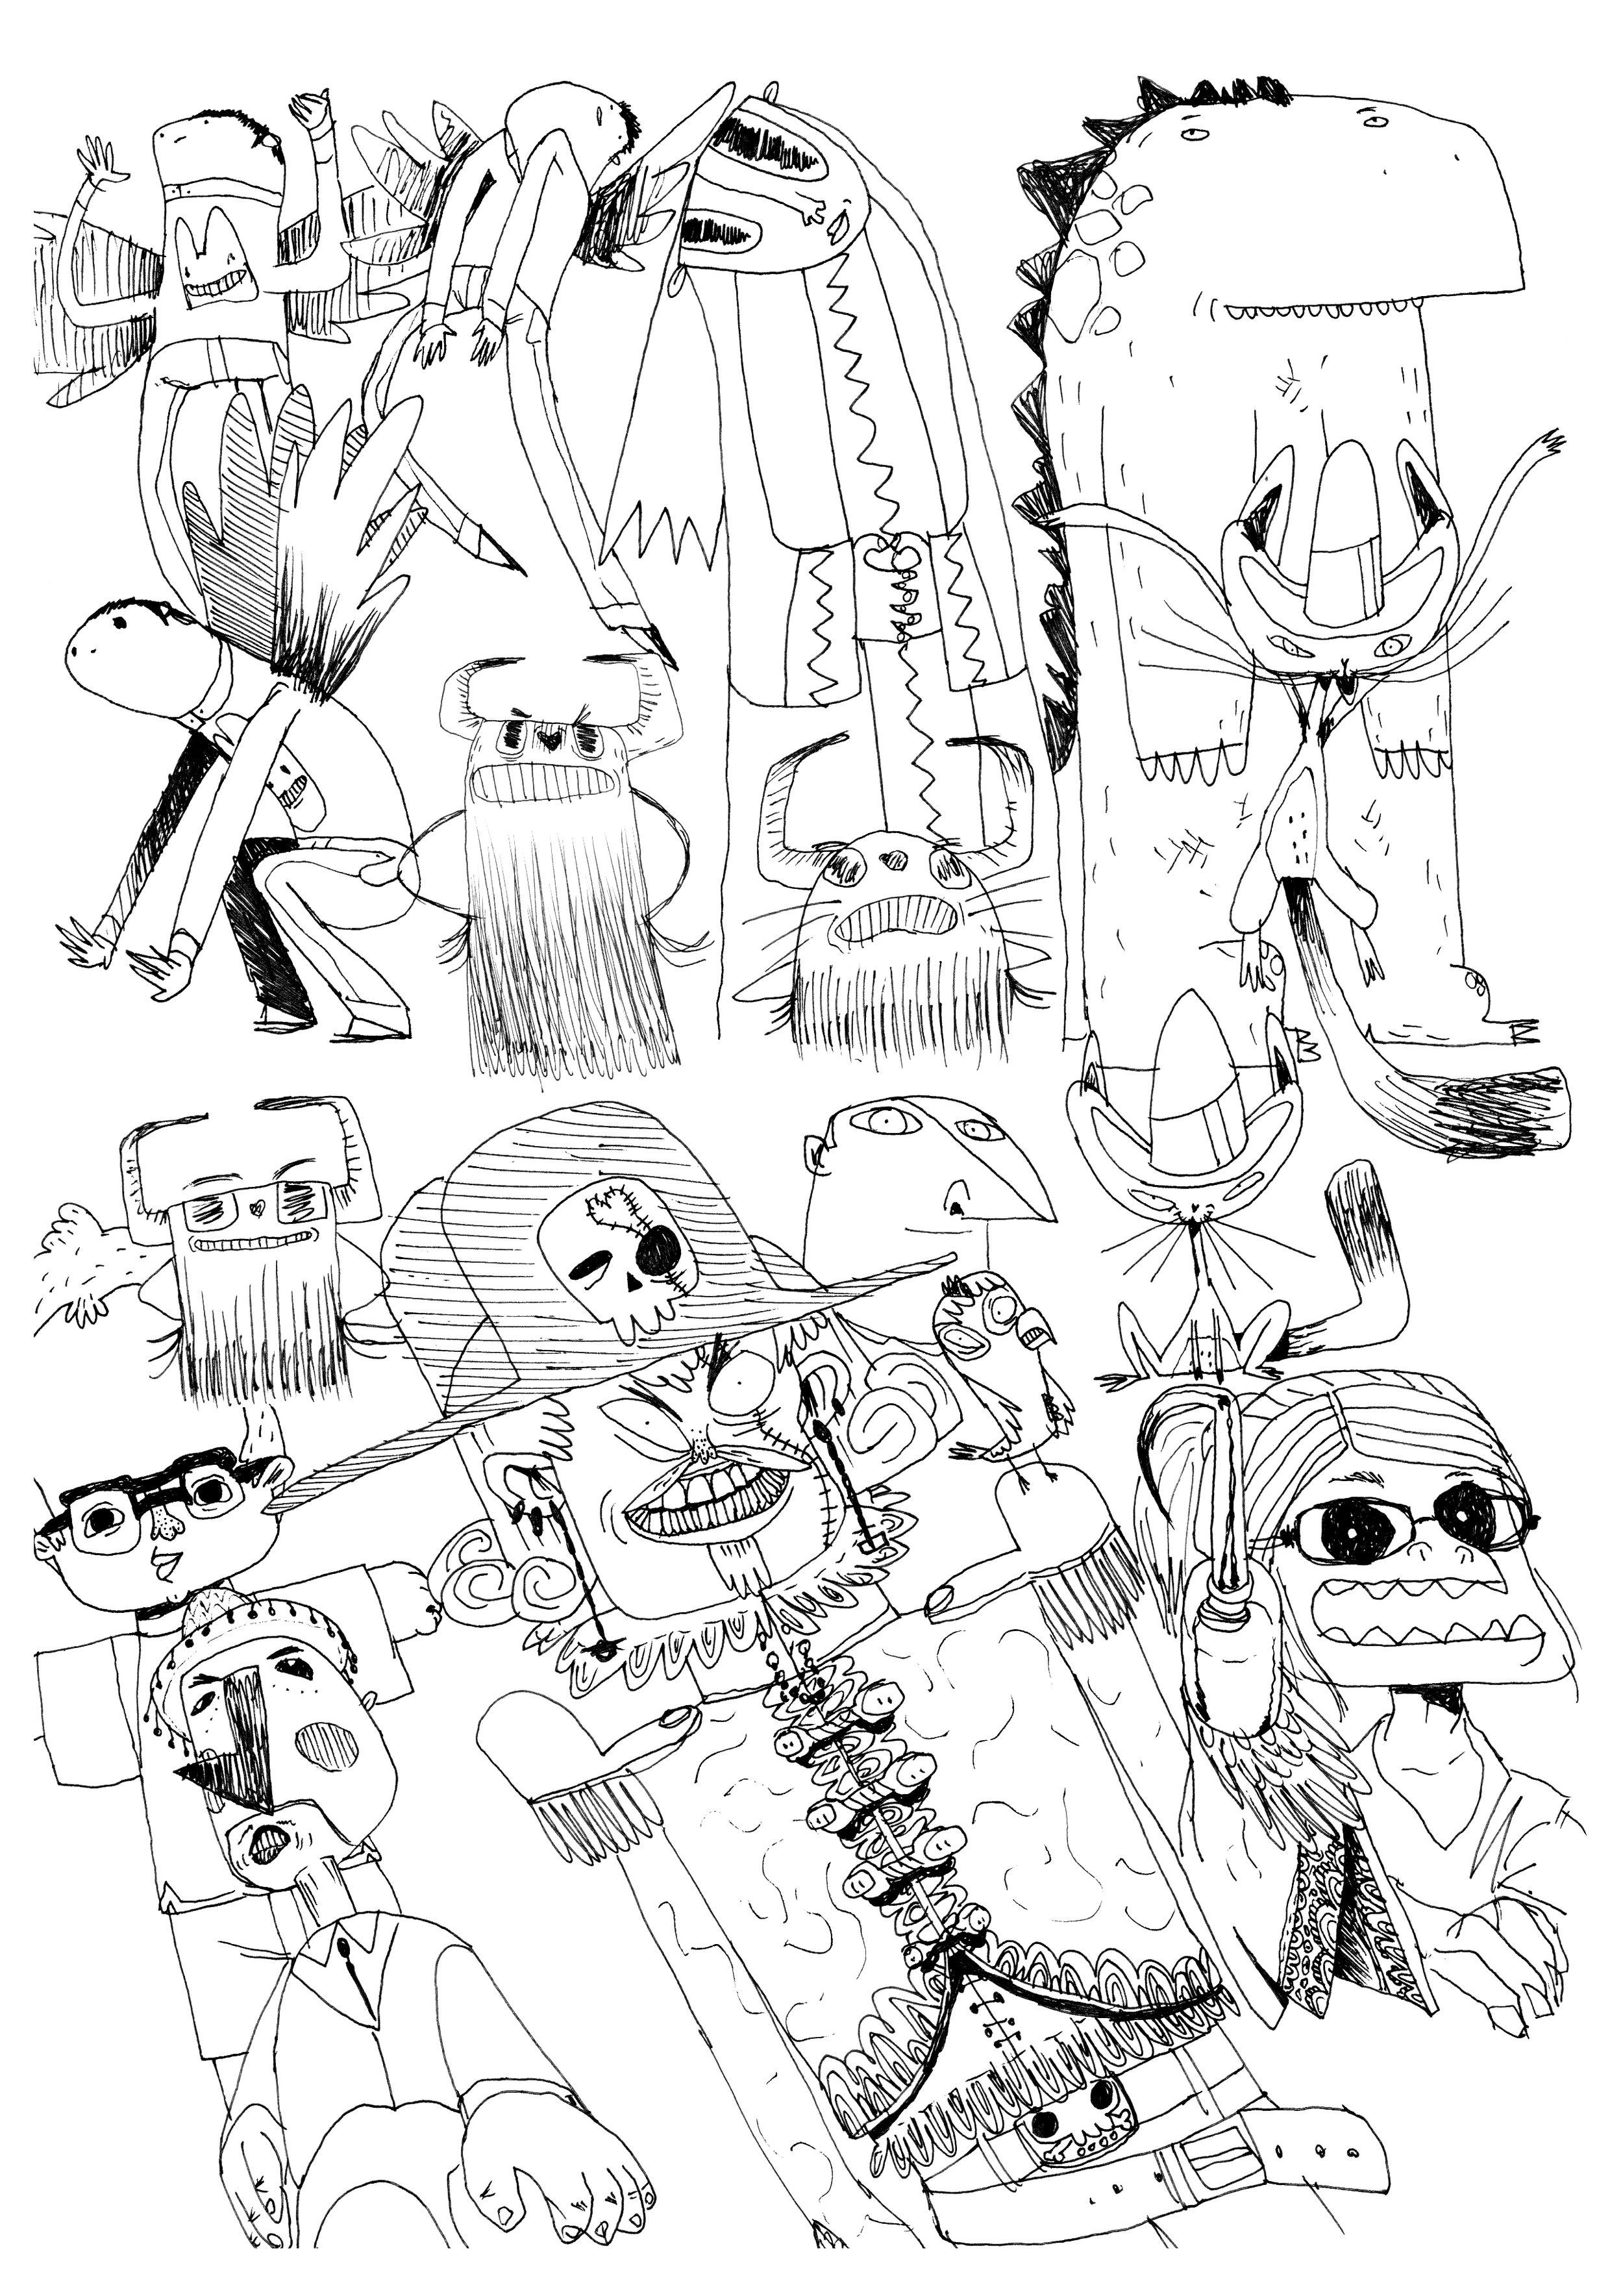 Pascal_Zaffiro_Doodle_10.jpg